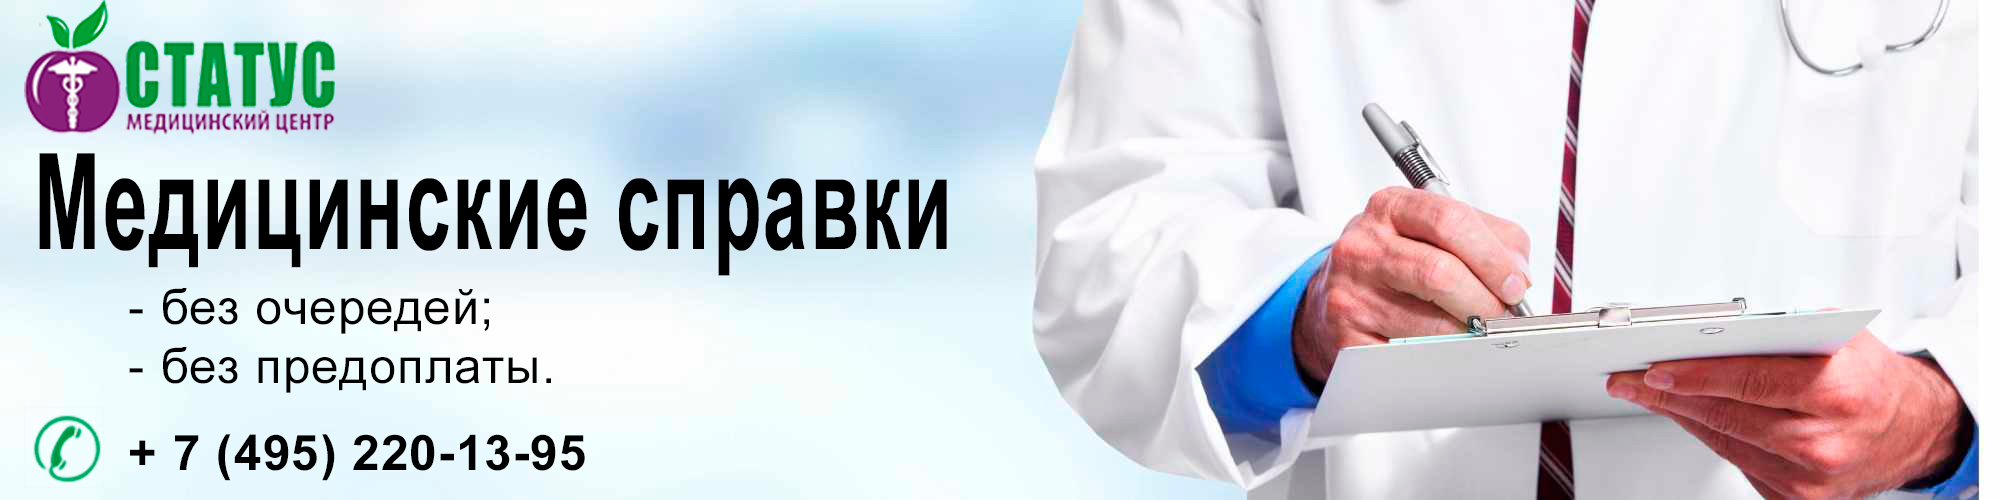 Медсправка 086 Москва Куркино